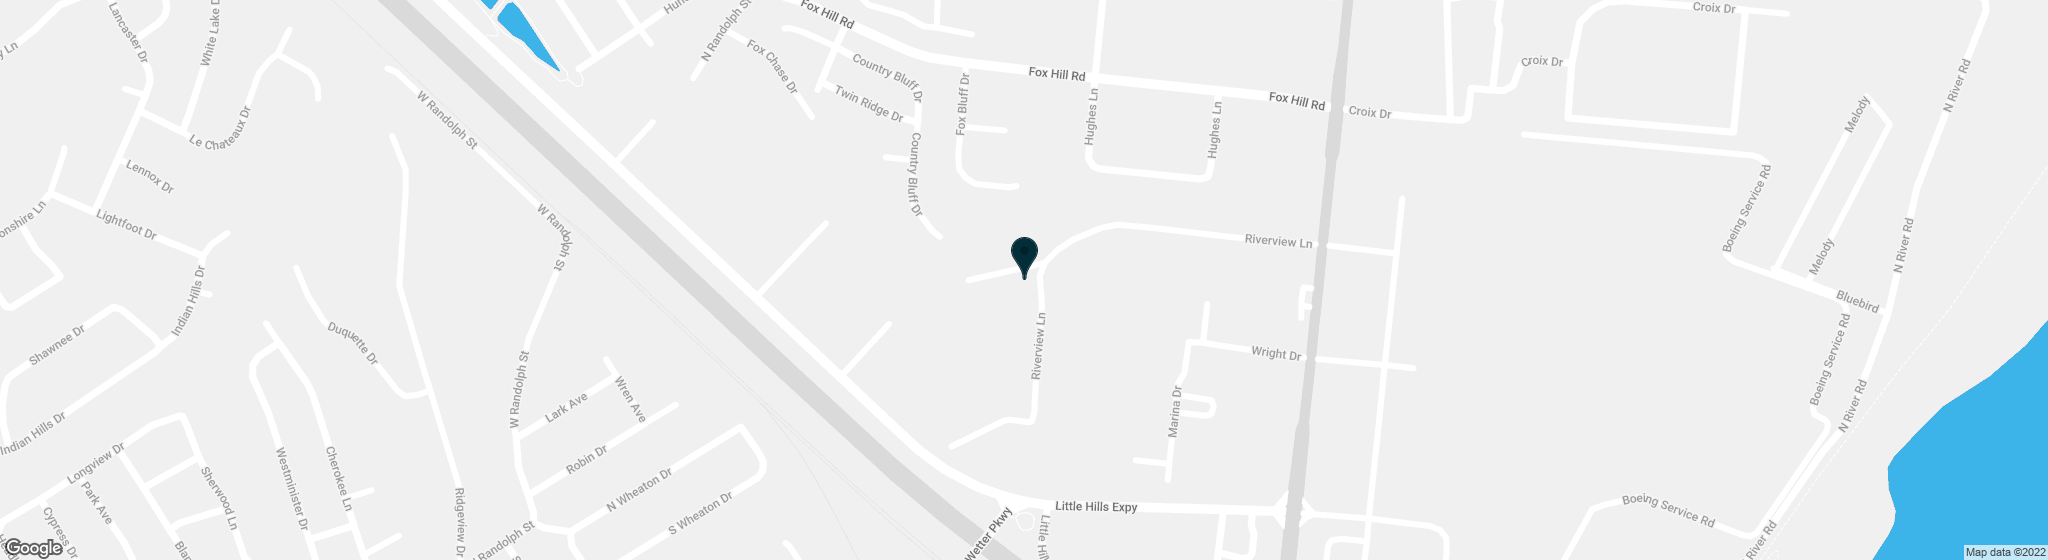 600 Riverview Lane St Charles MO 63301